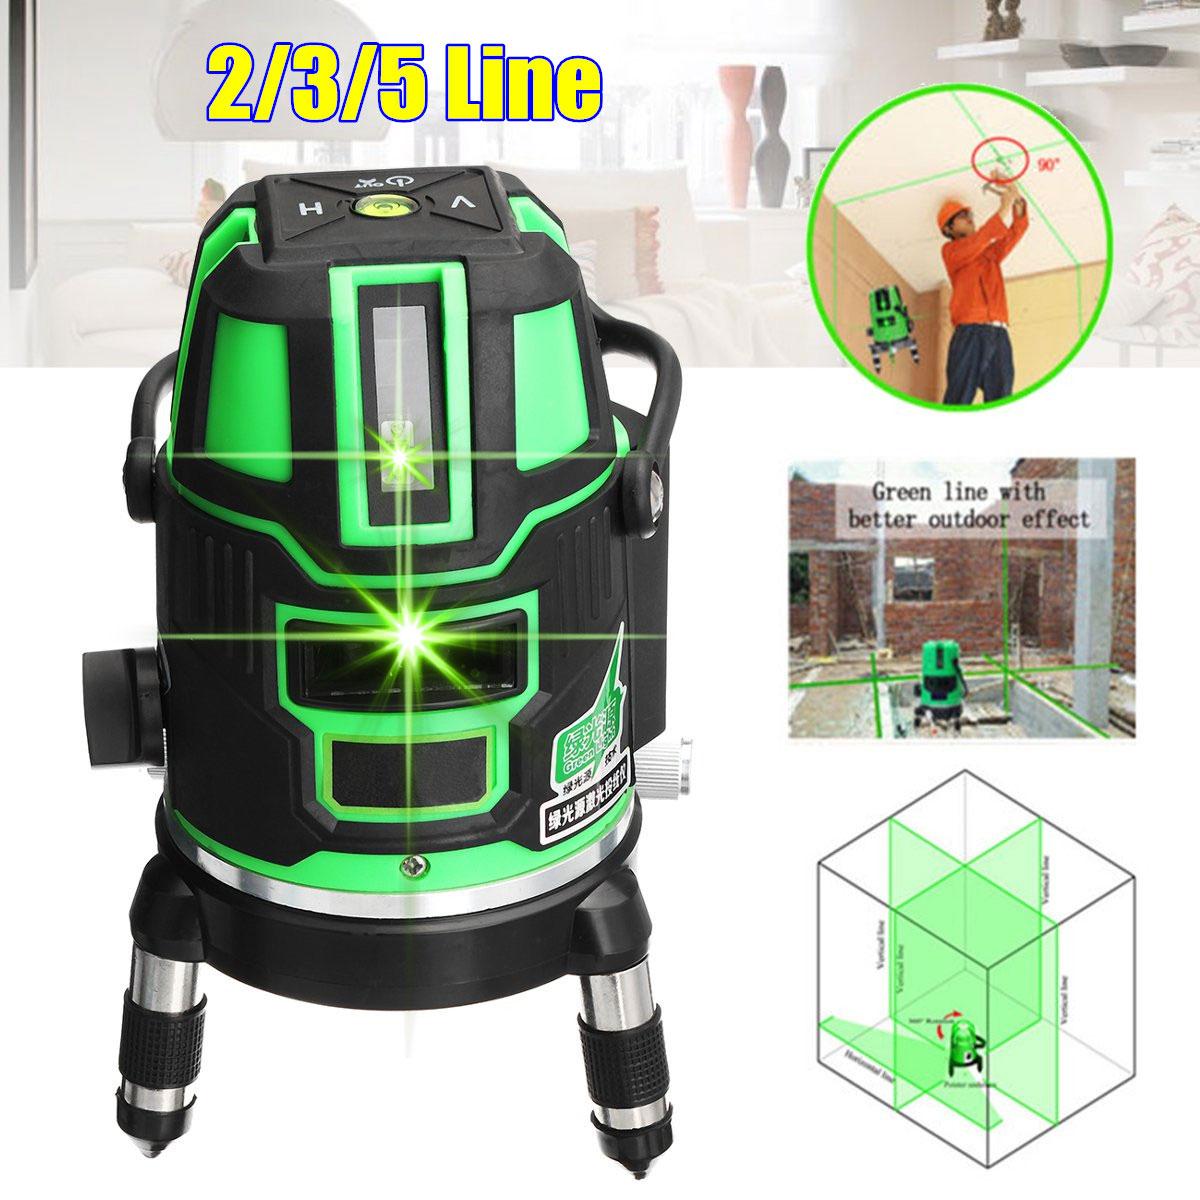 3D 2 3 5 Line 360C Green Rotary Cross Laser Level Self Leveling